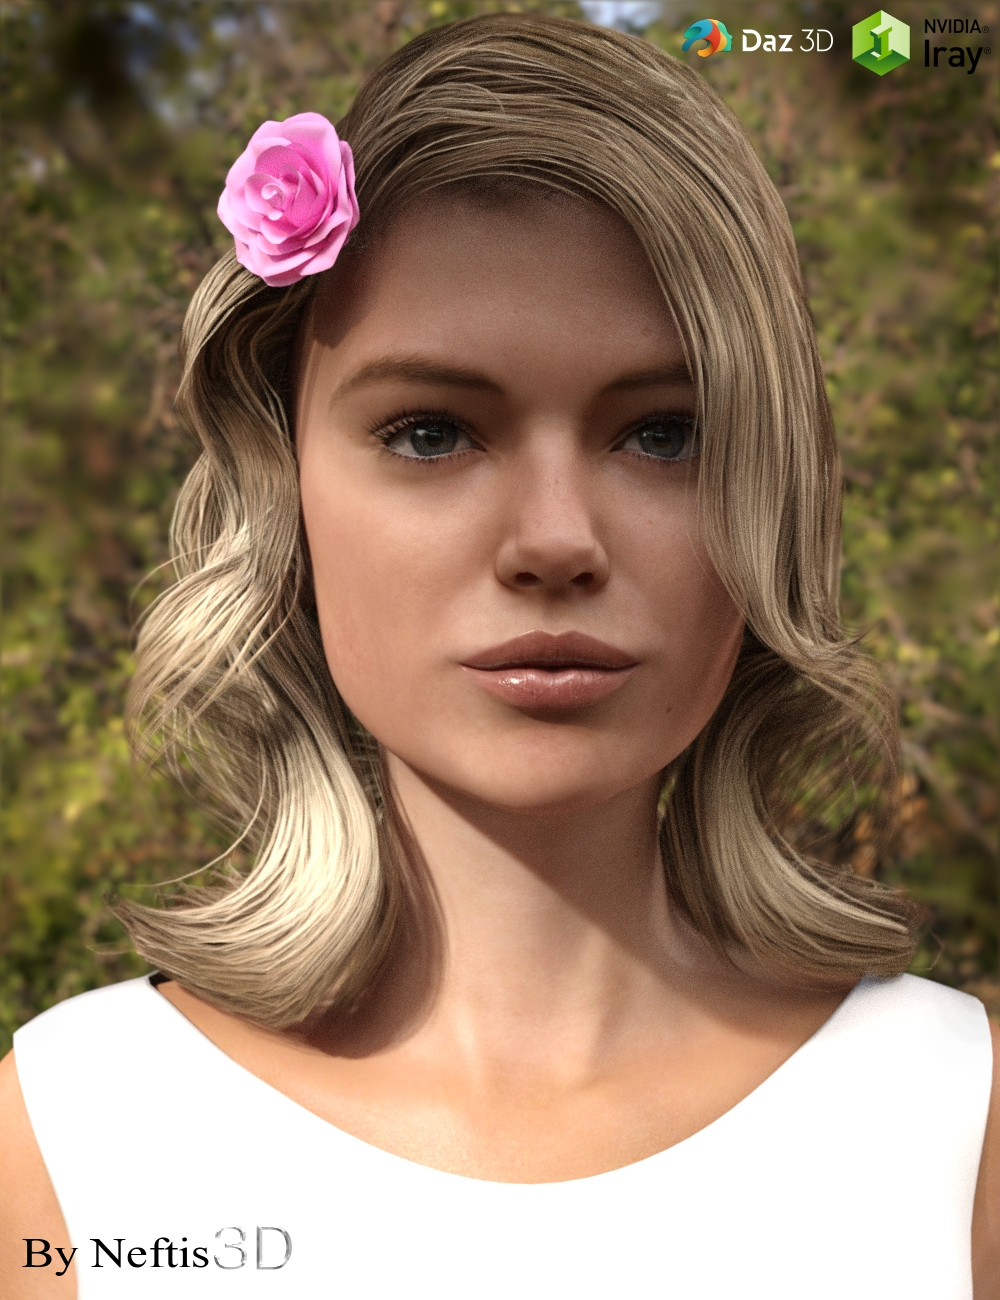 AnnaRose Hair for Genesis 3 Female(s) by: Neftis3D, 3D Models by Daz 3D